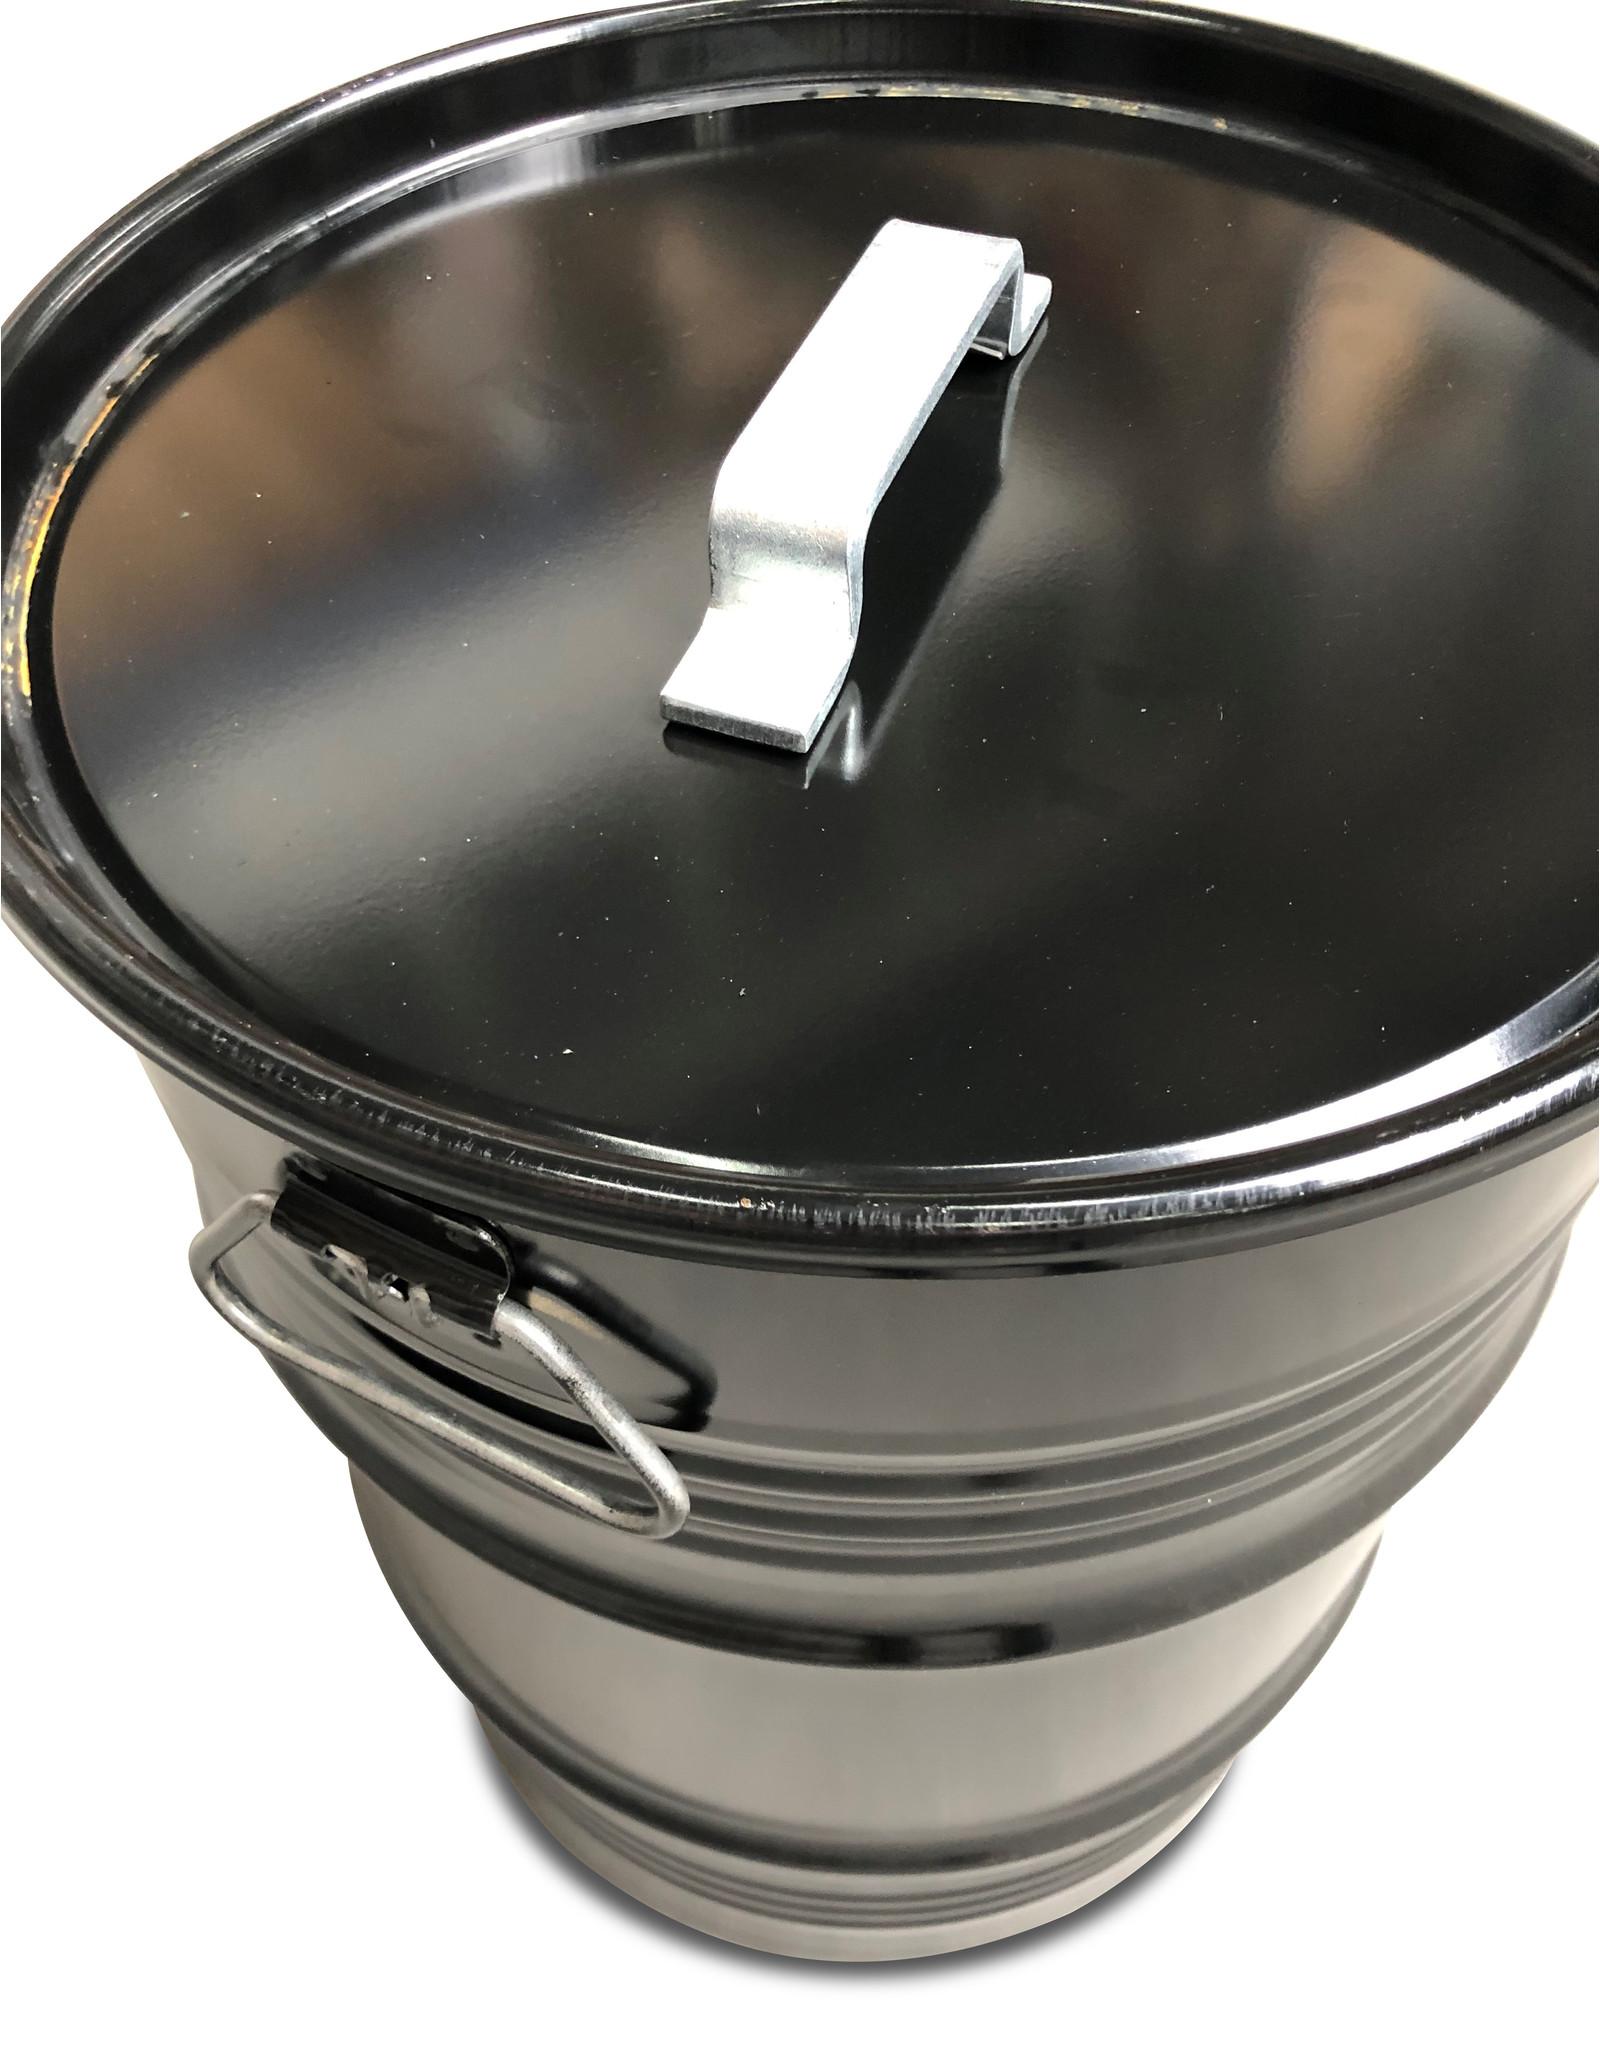 BinBin BinBin Handle industriële prullenbak zwart 60 Liter olievat met handvat deksel